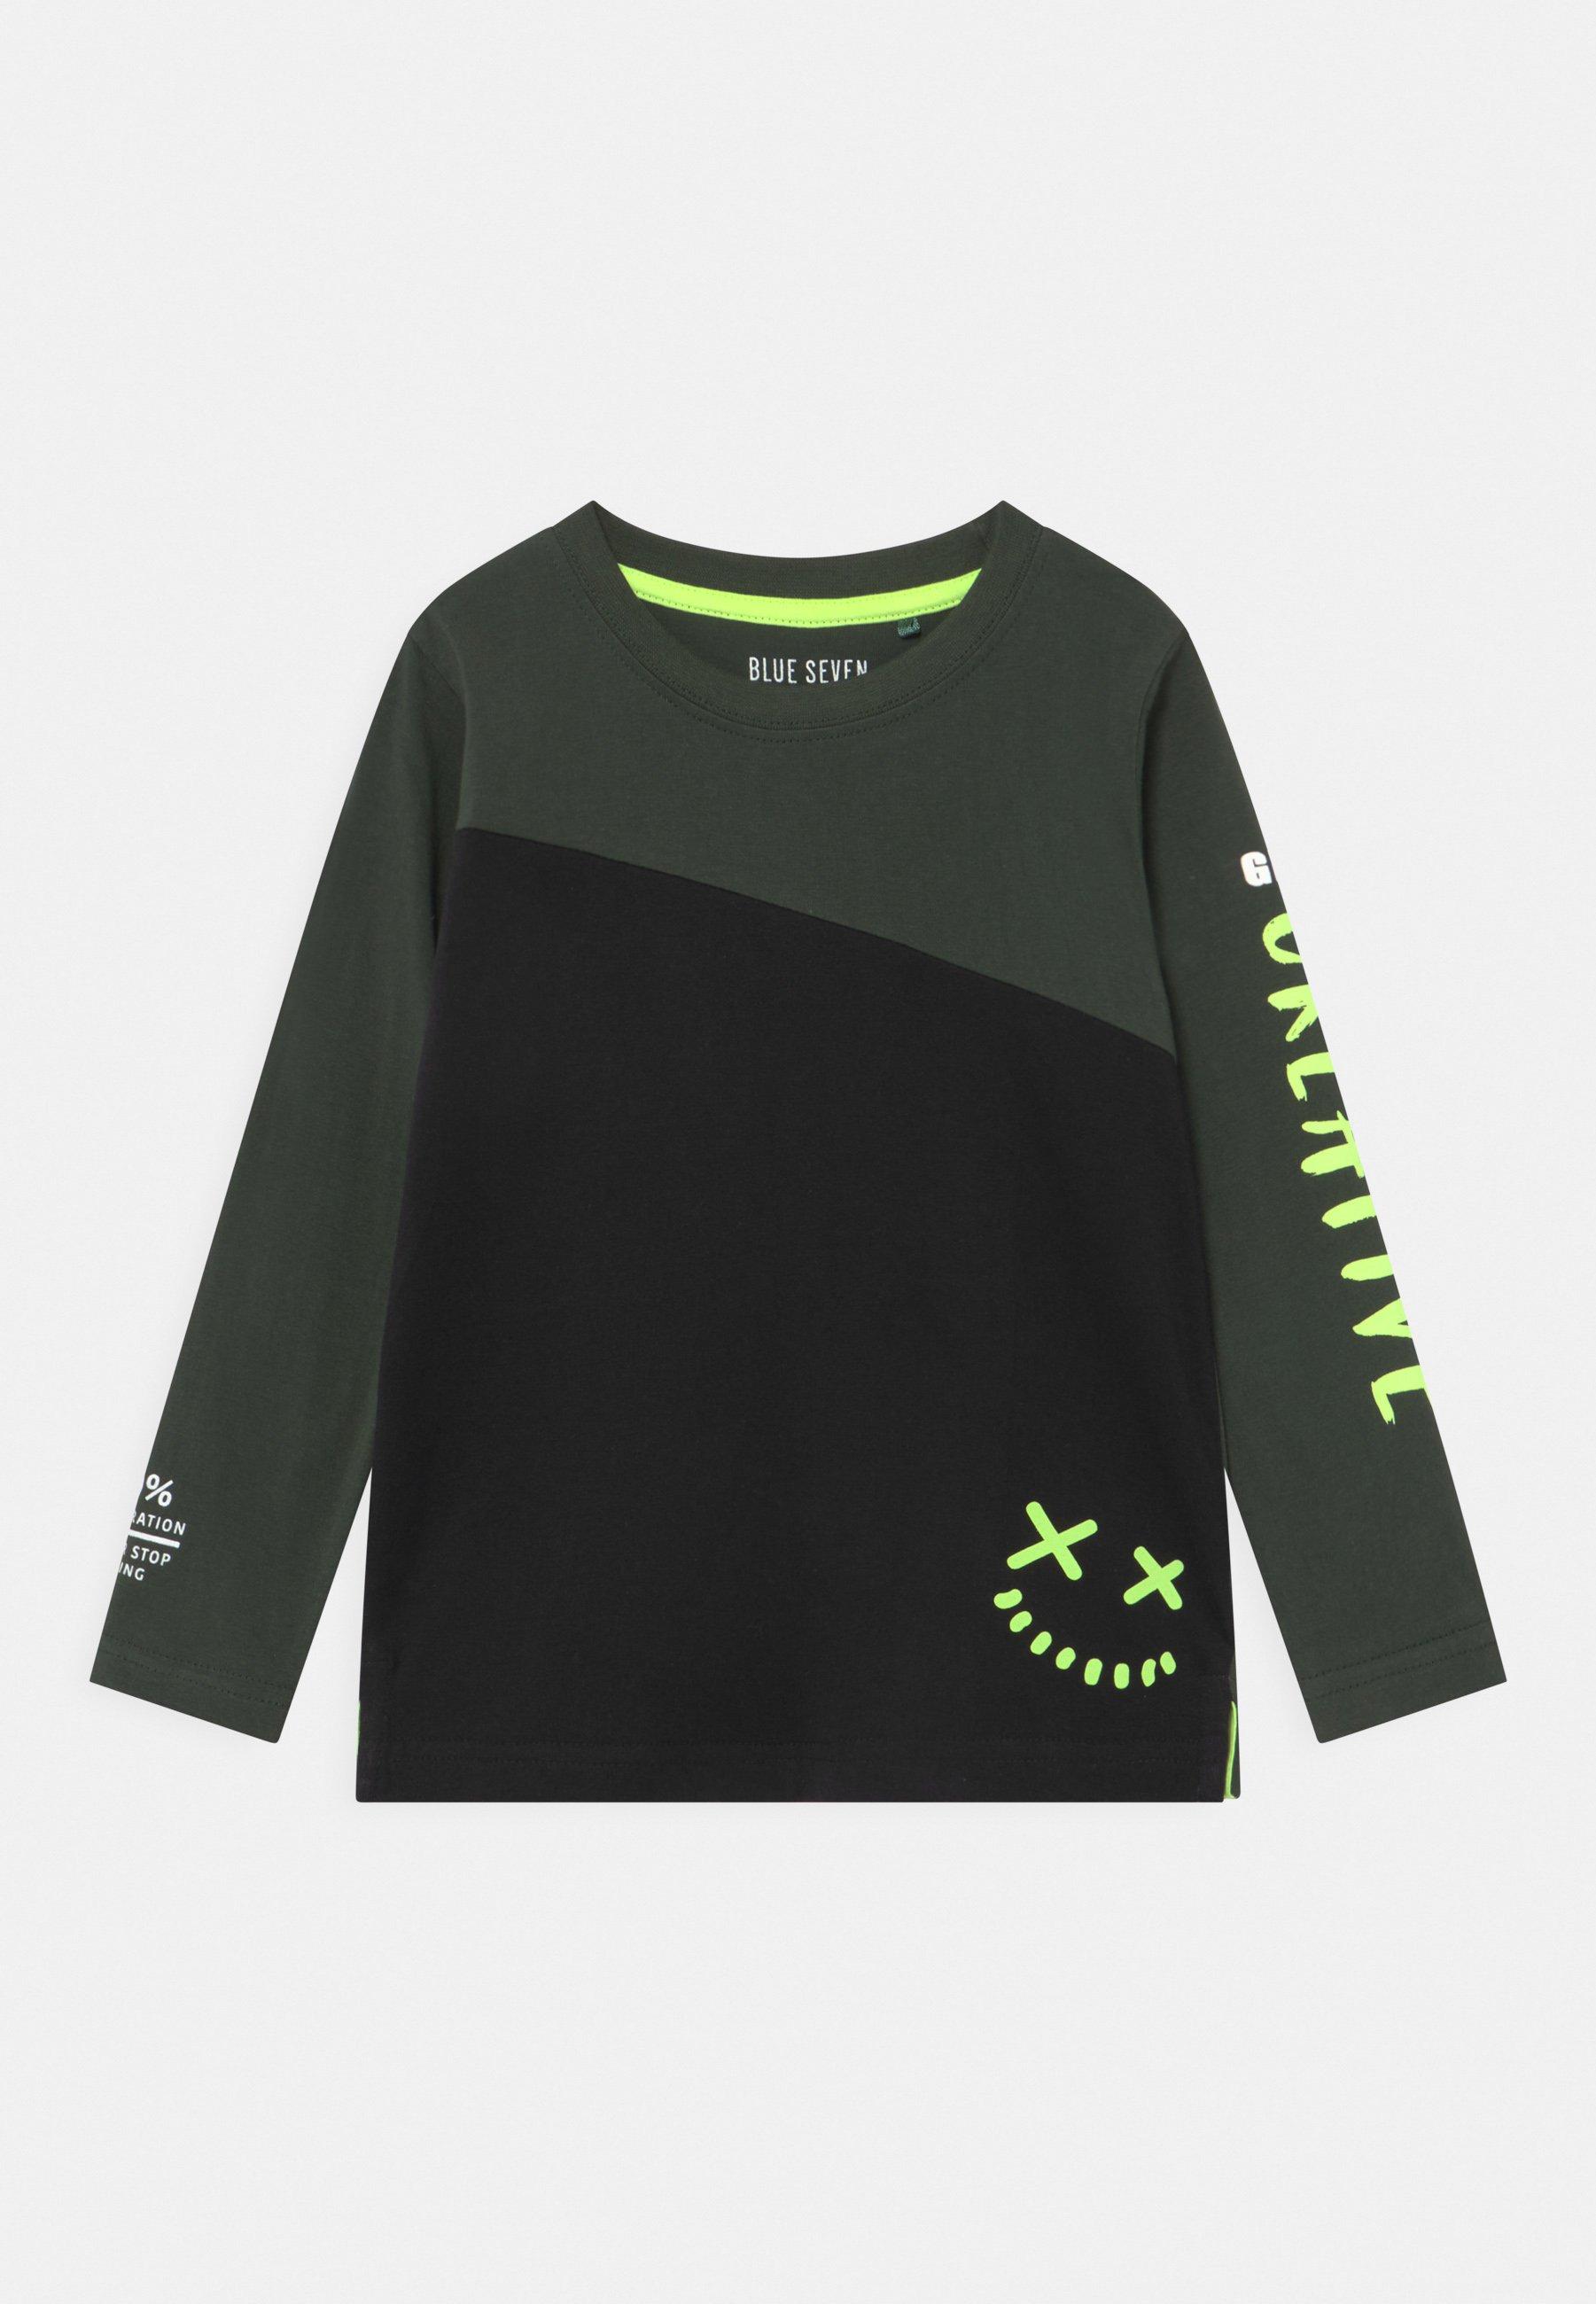 Børn KIDS SMALL BOYS - Langærmede T-shirts - schwarz